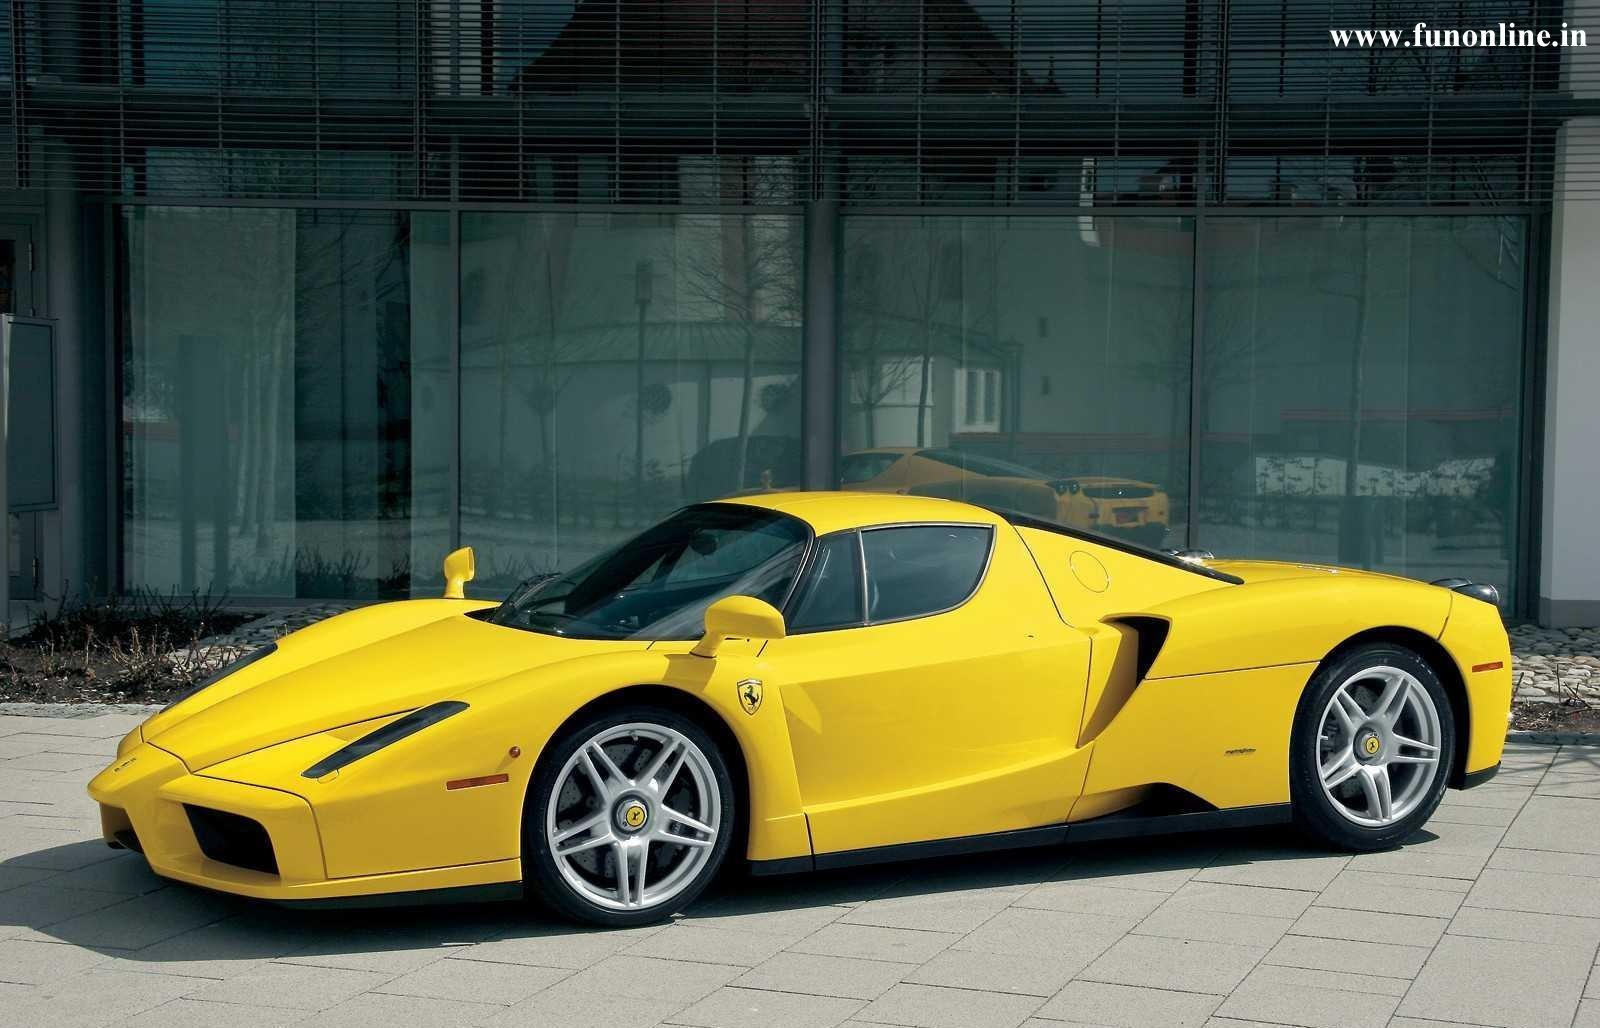 Ferrari Cars 8 Car Background Wallpaper